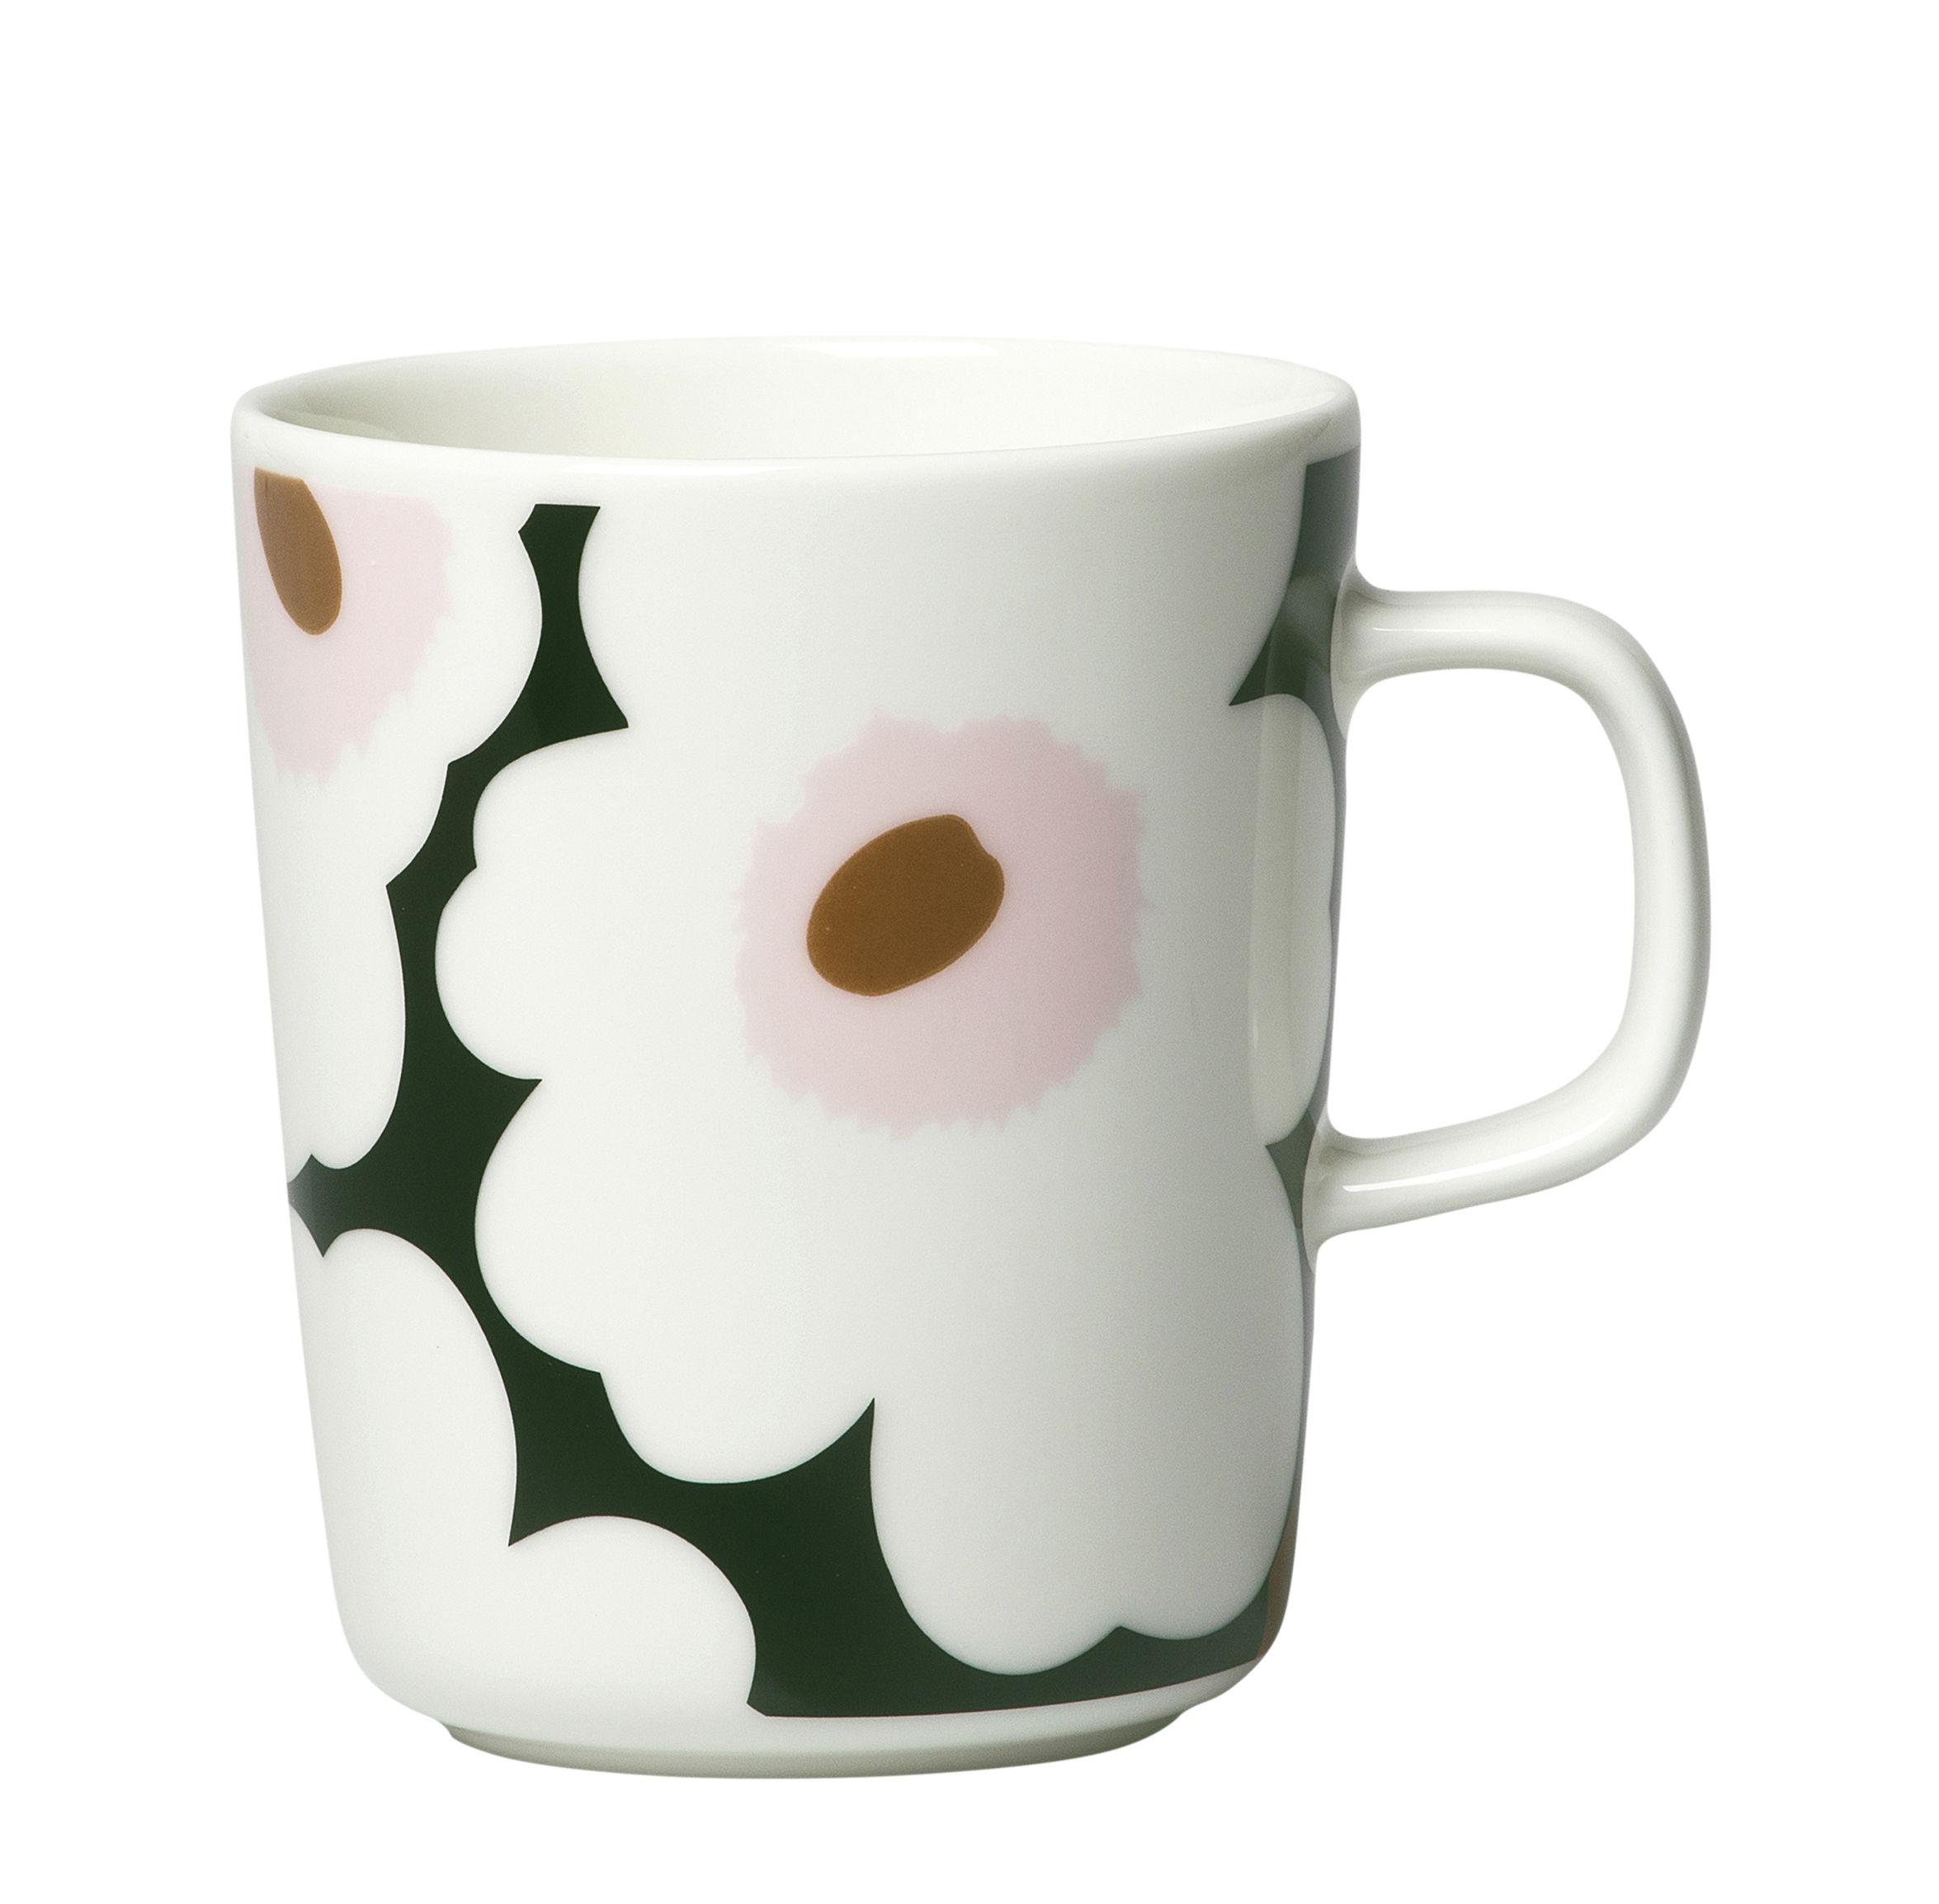 Arts de la table - Tasses et mugs - Mug Unikko / 25 cl - Marimekko - Unikko / Blanc & rose - Grès